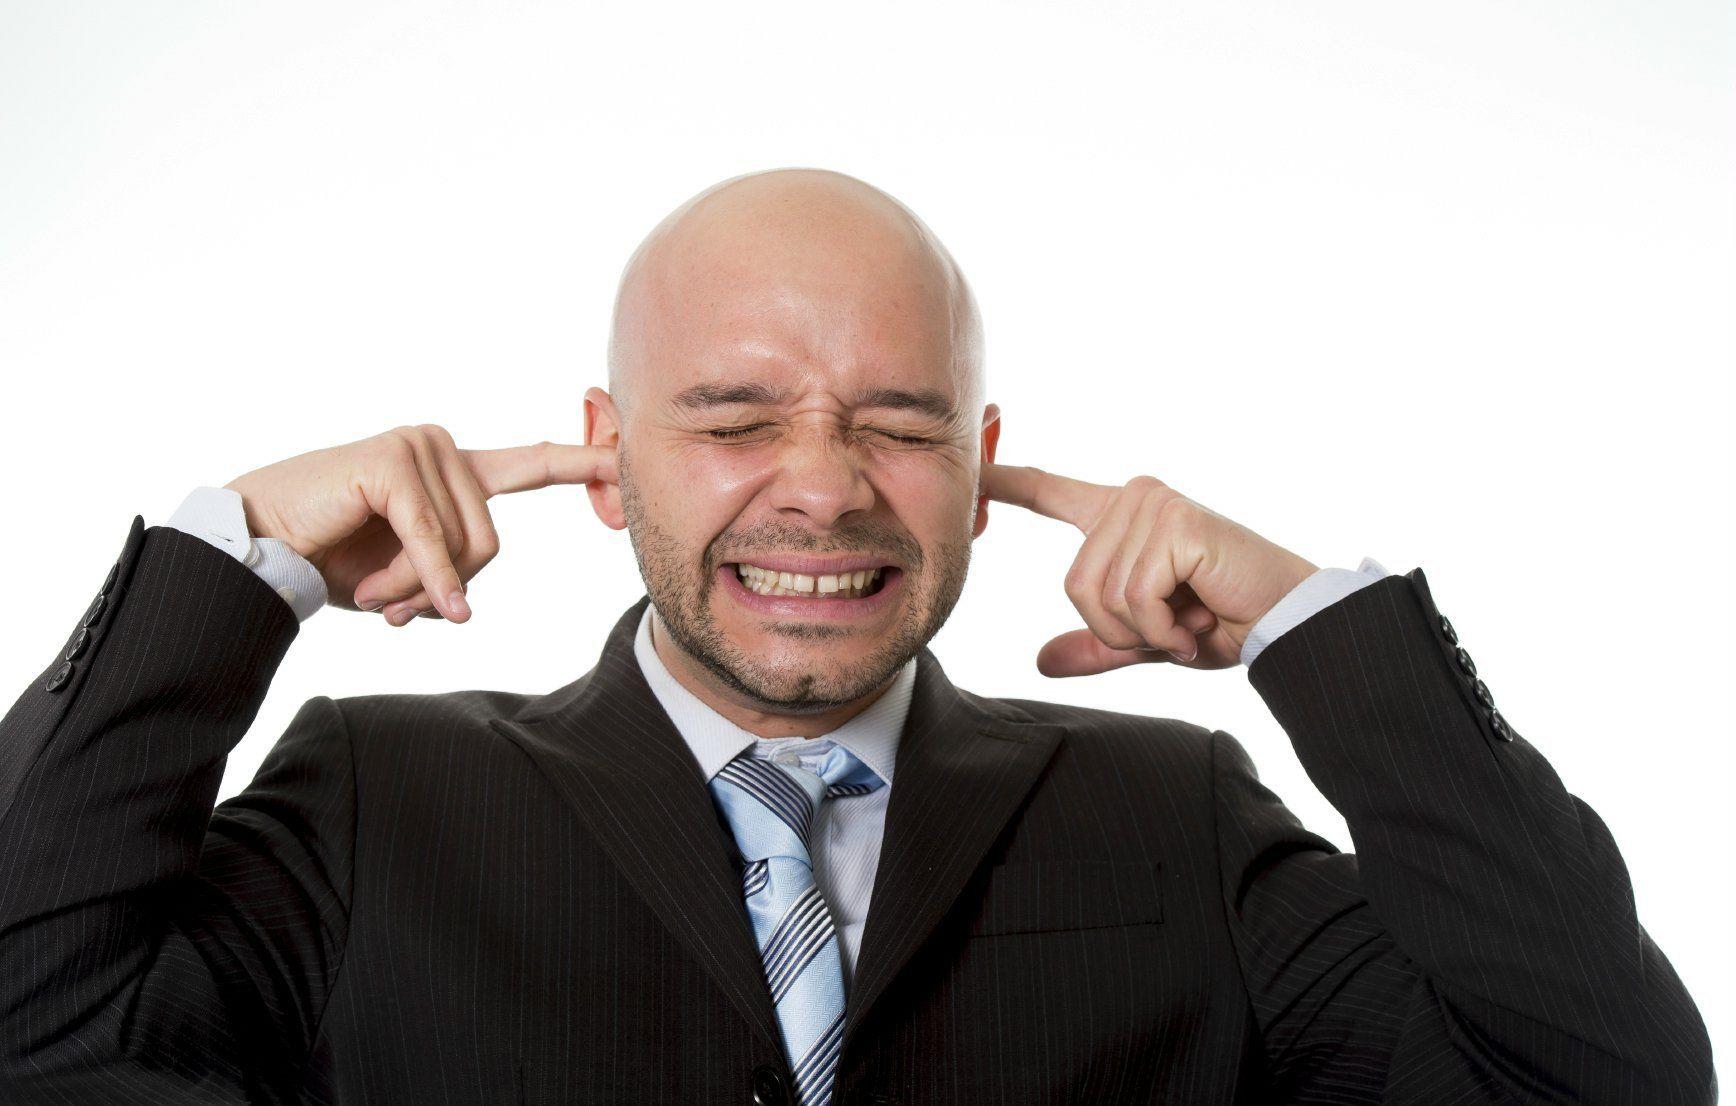 businessman-cover-ears-business-man